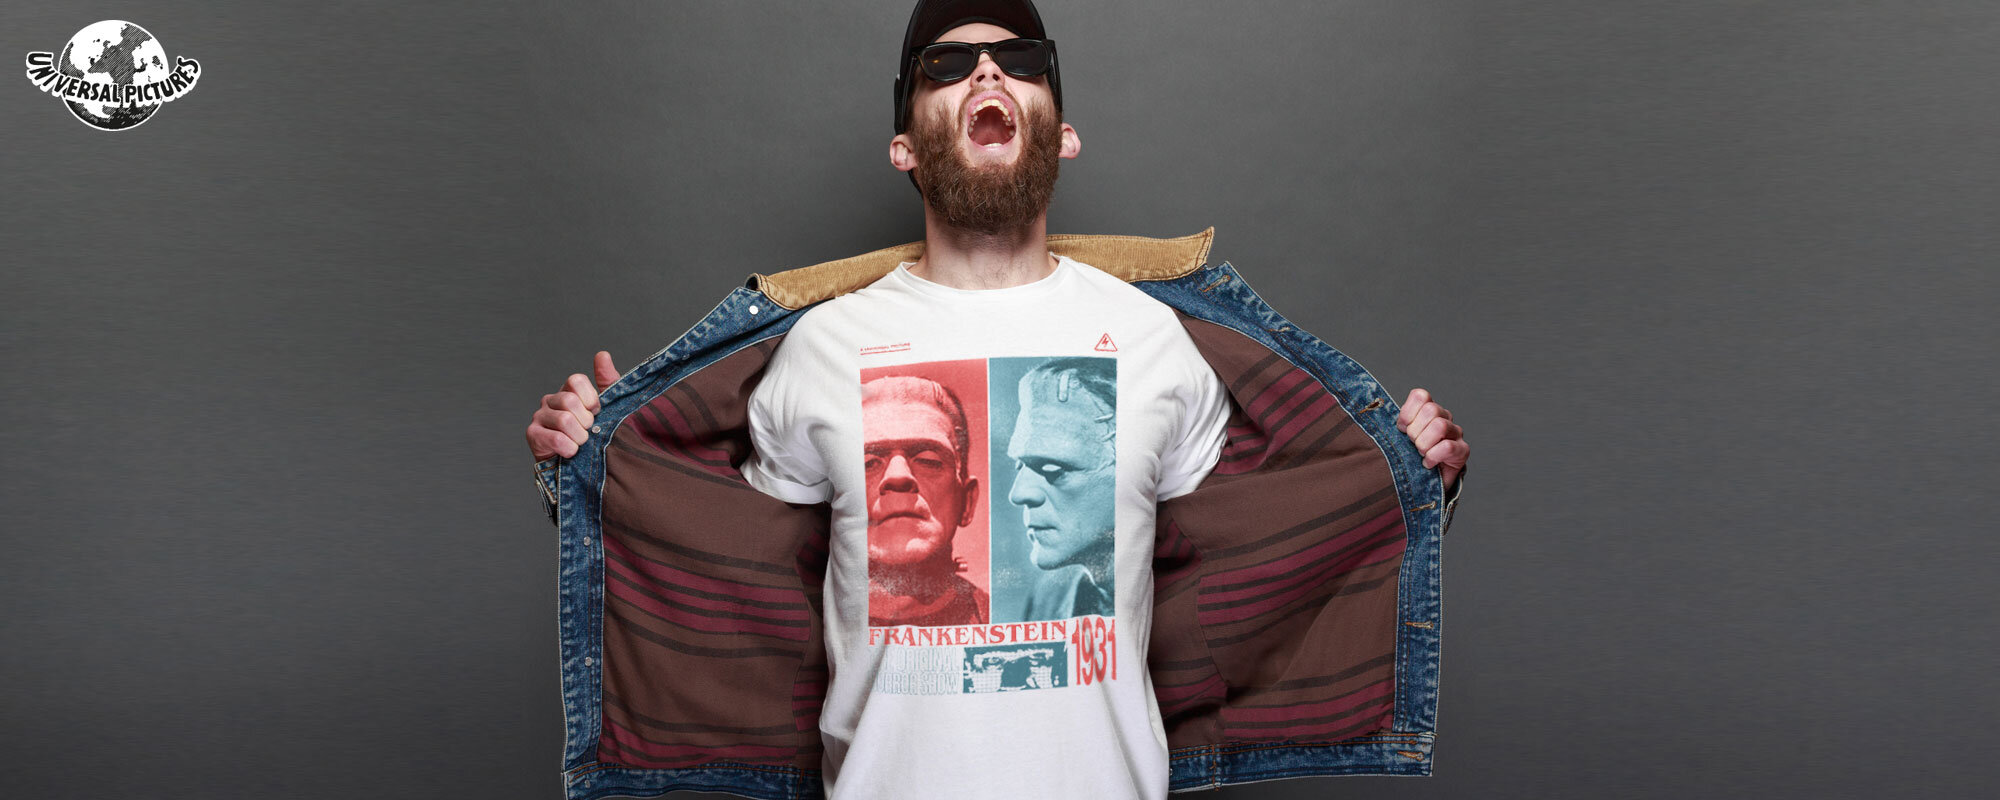 https://www.shirtstore.dk/pub_docs/files/Startsida2021/2021-UniversalMonsters.jpg